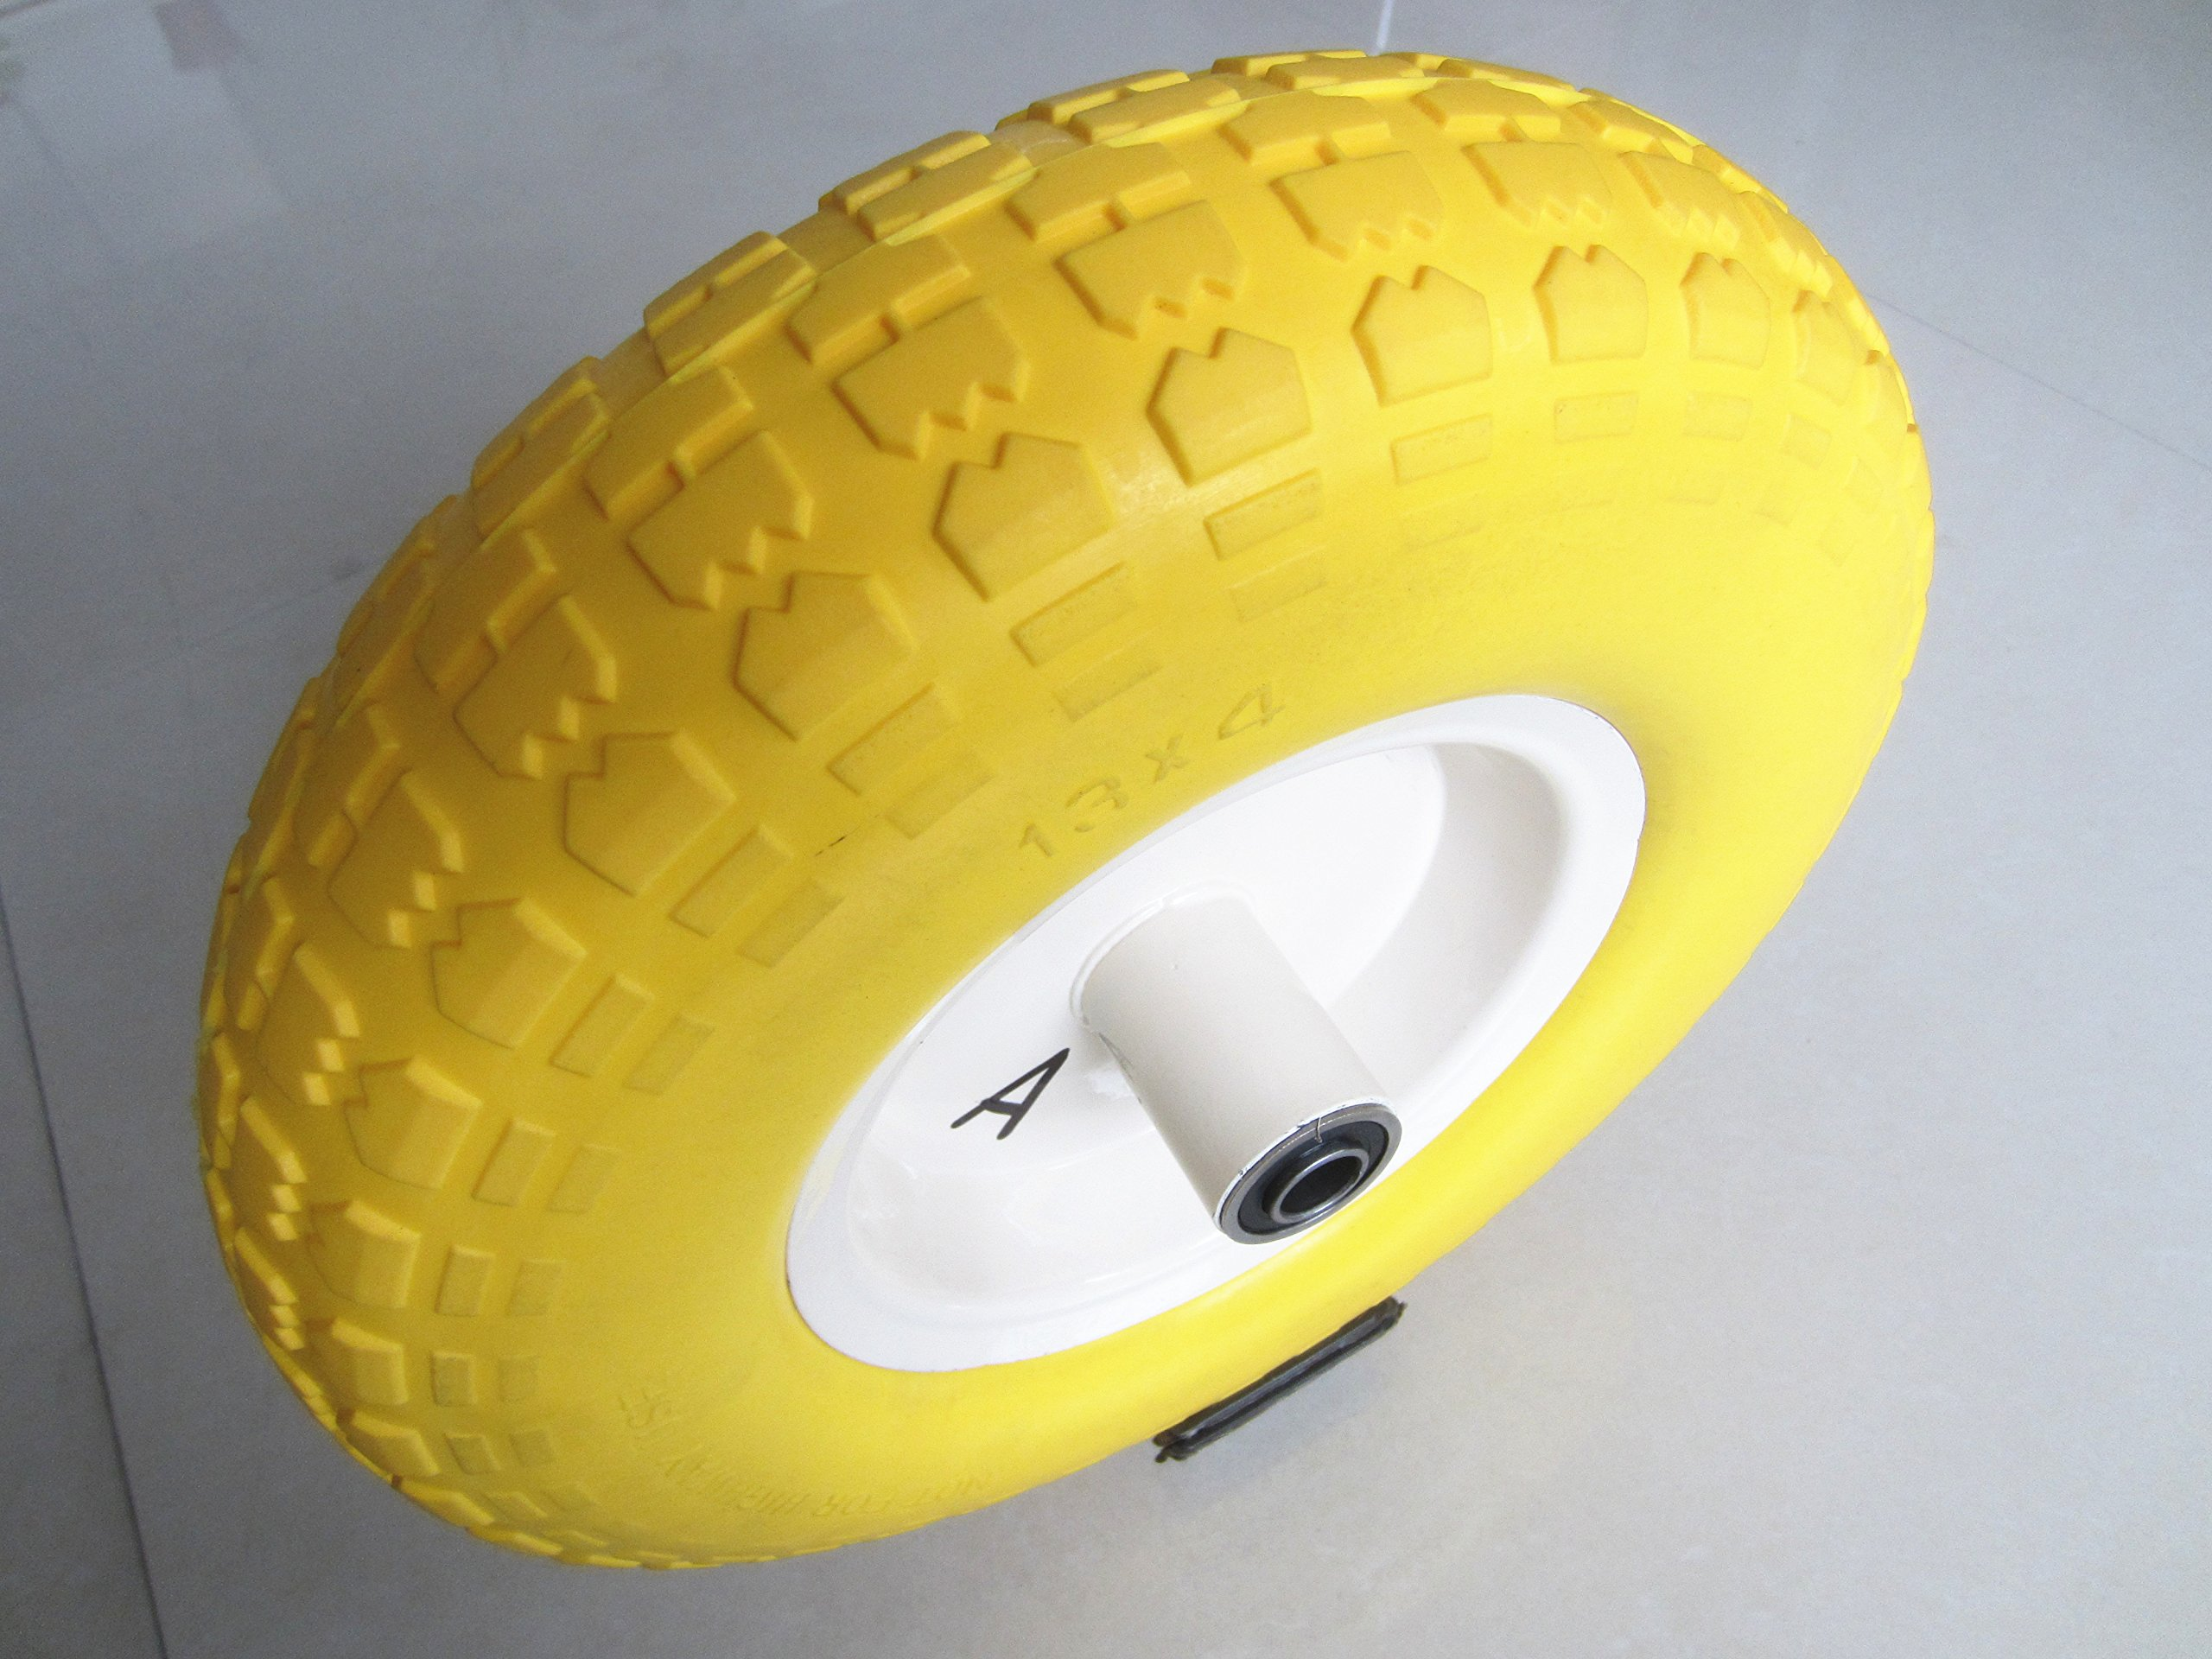 Kunhua 14-pu-y-sz-16 4.00-6-inch Flat Free Wheelbarrow Tire - 4.5-inch Centered Hub(two sides symmetrical) - 5/8-inch Ball Bearings - 13-inch Tire Diameter